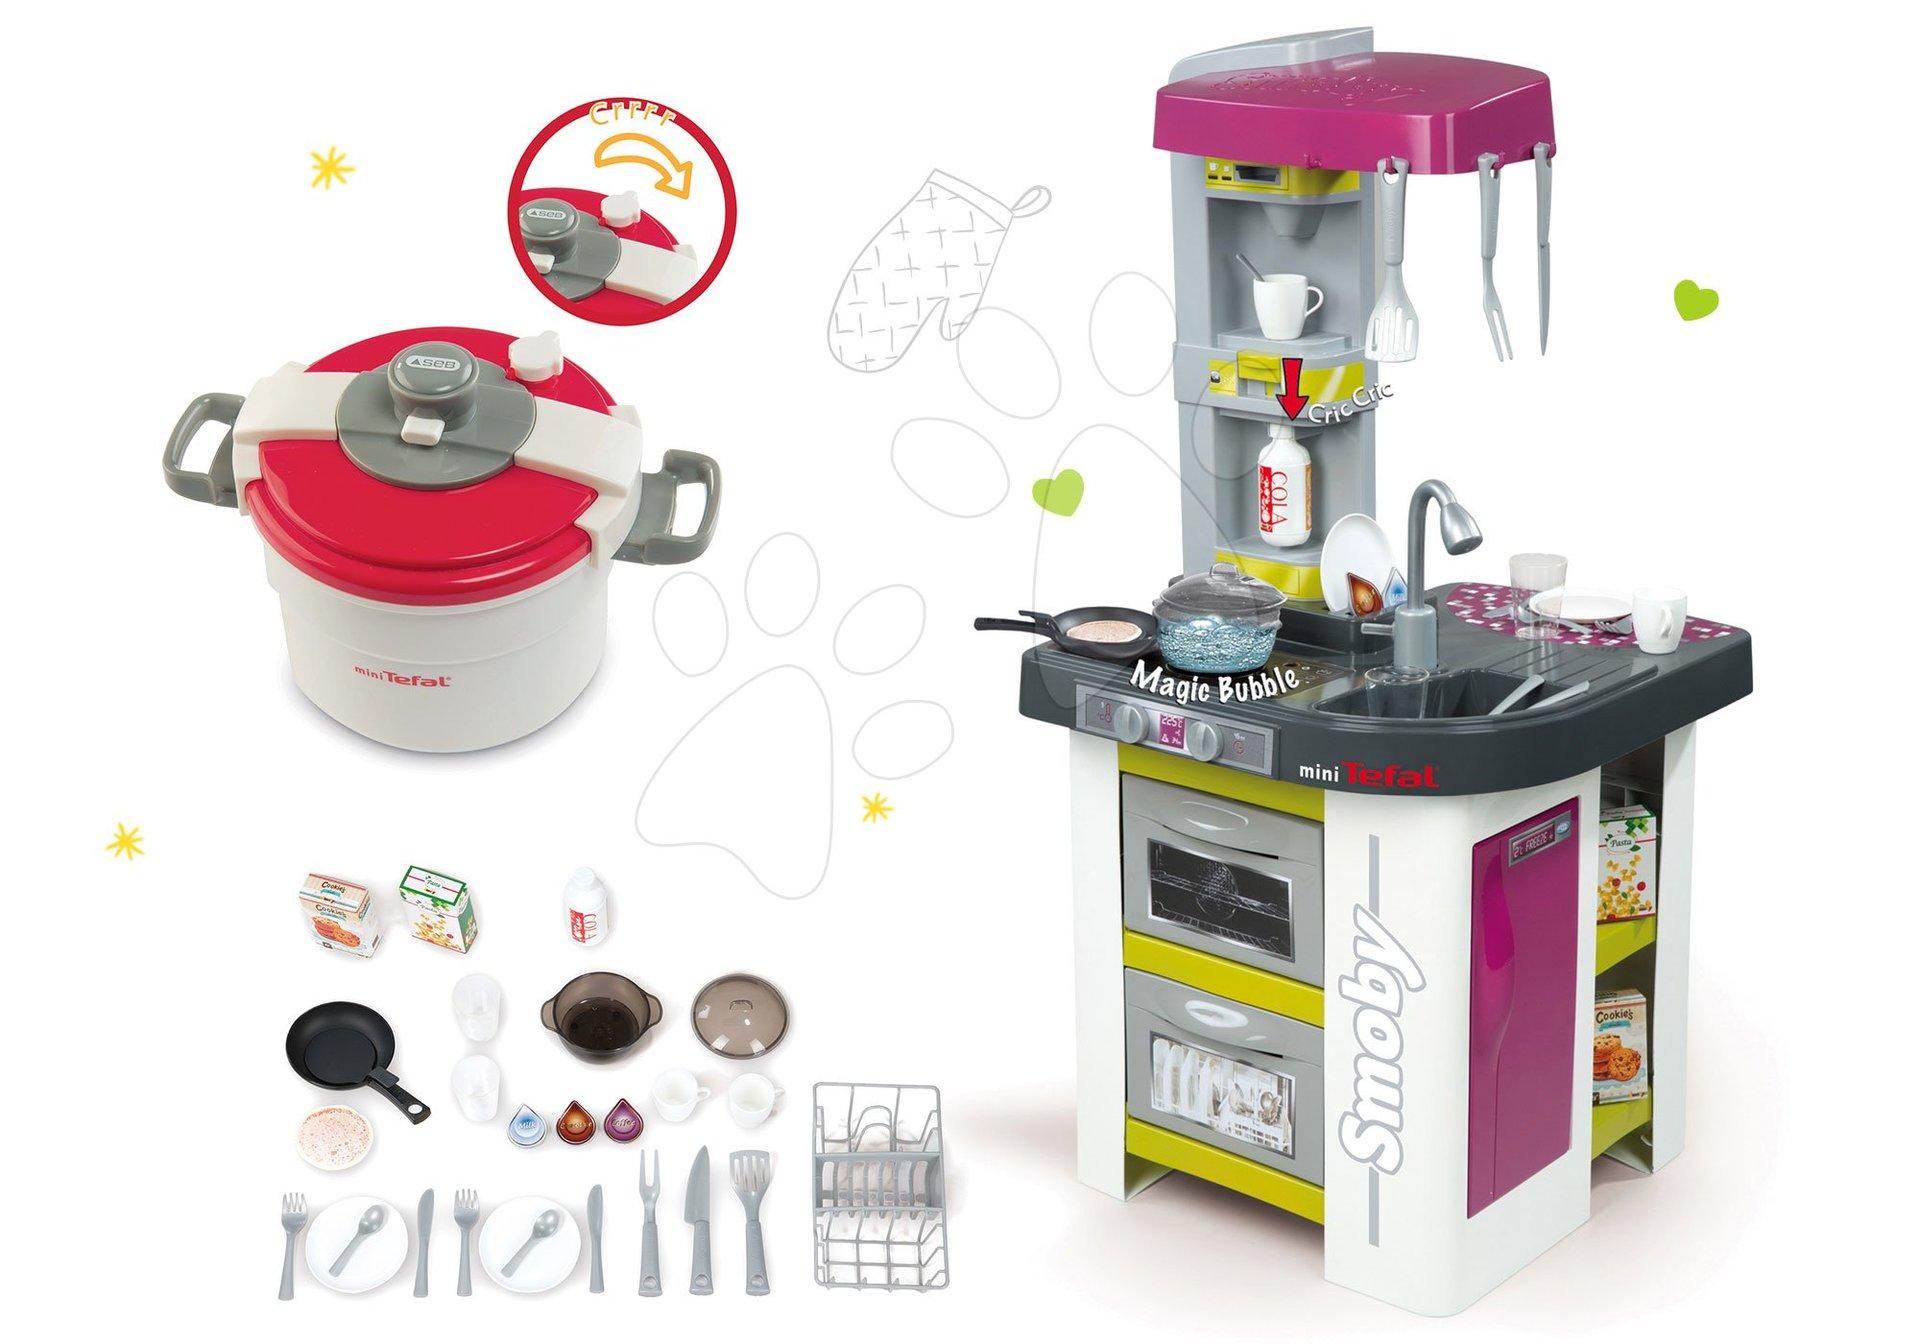 Set kuchyňka Tefal Studio BBQ Bublinky Smoby s magickým bubláním a tlakový hrnec Tefal